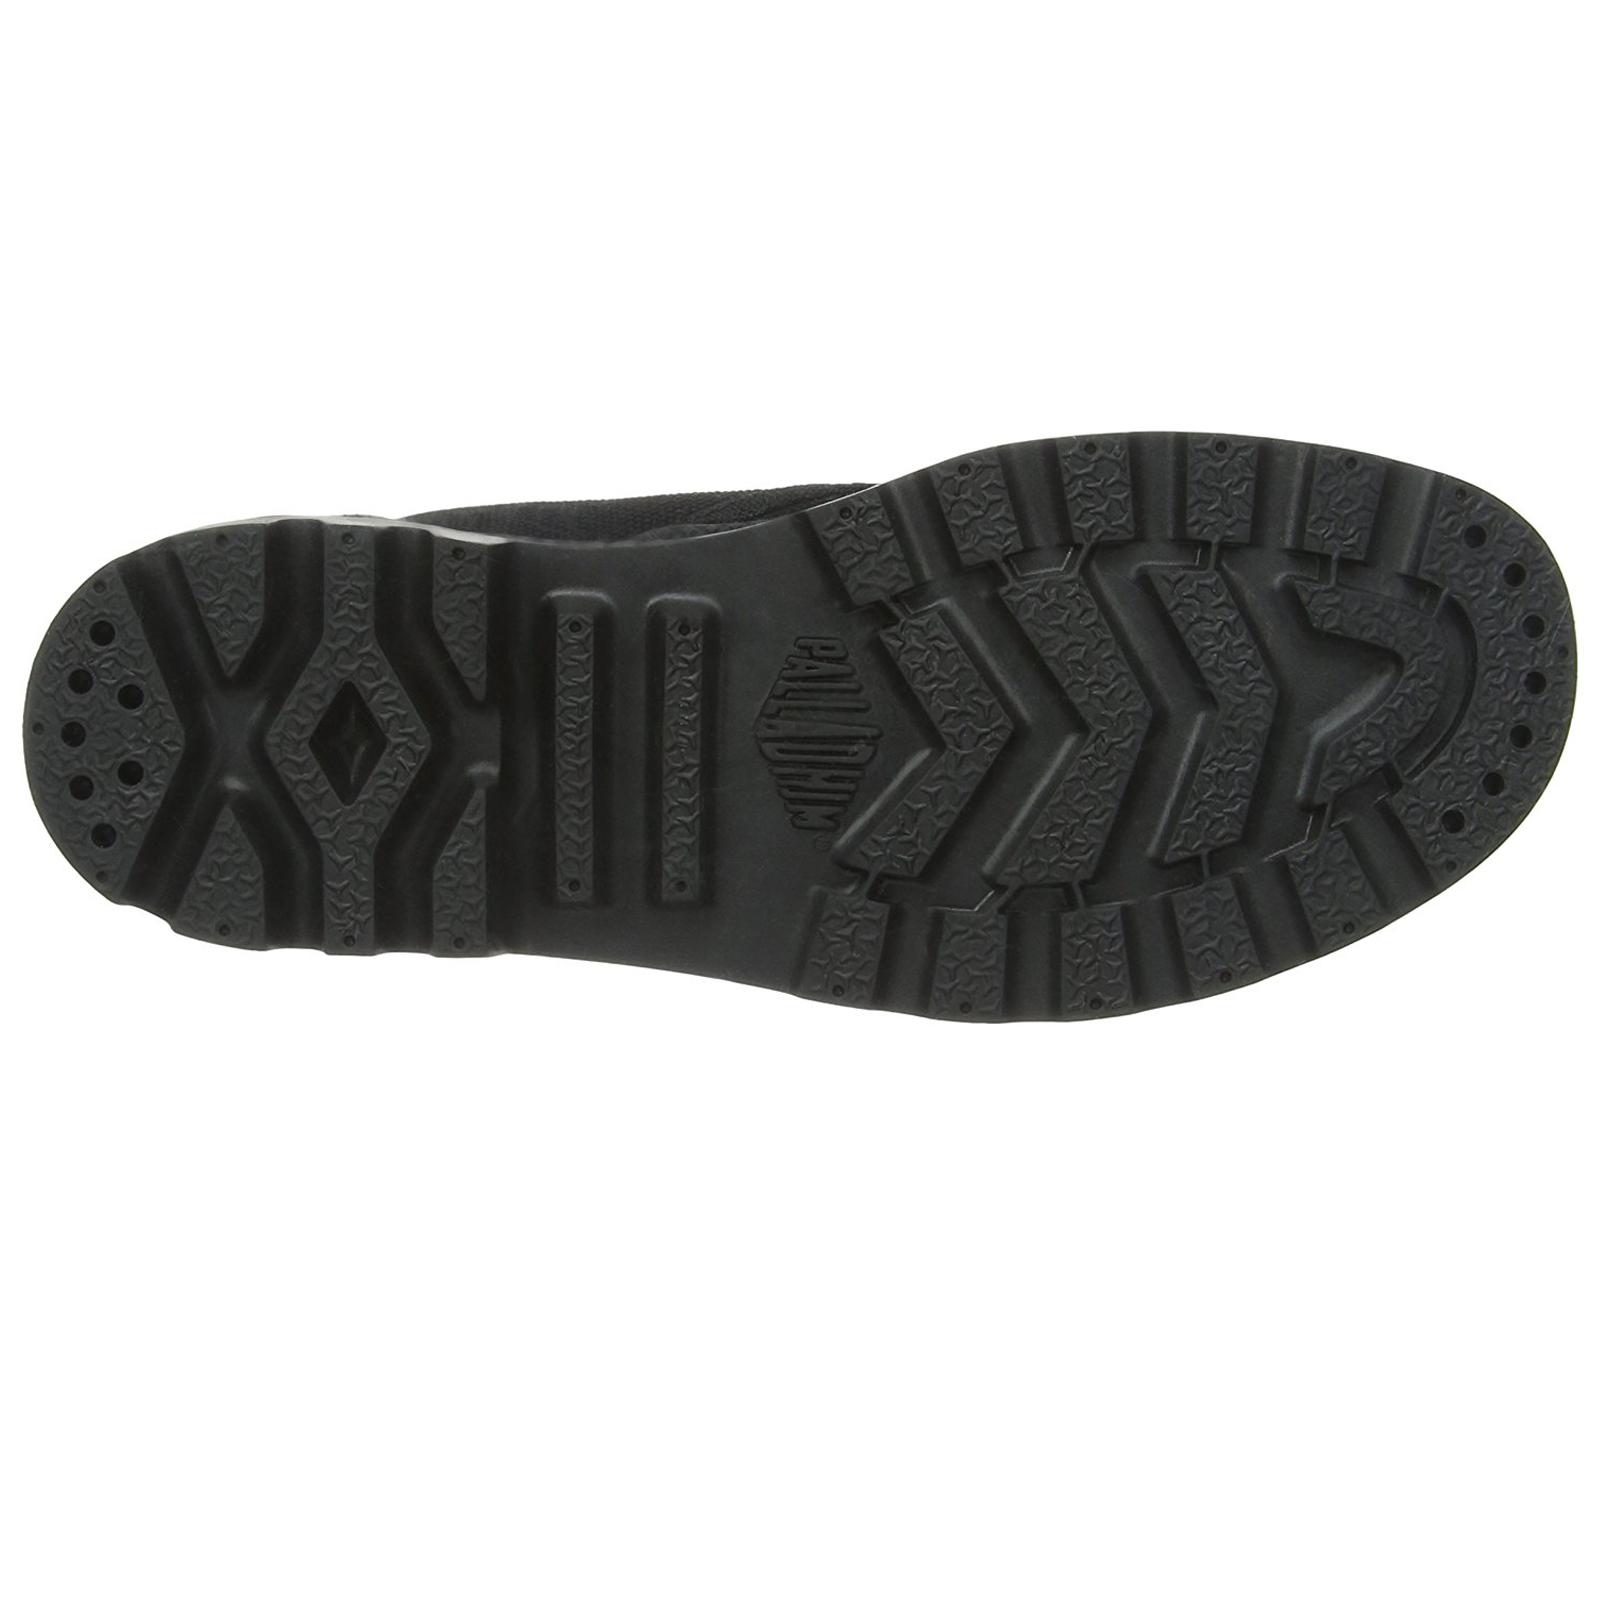 Palladium-Damen-Stiefeletten-Stiefel-Pampa-Hi-Top-Damen-Canvas-Sneaker-Wanderschuhe Indexbild 8